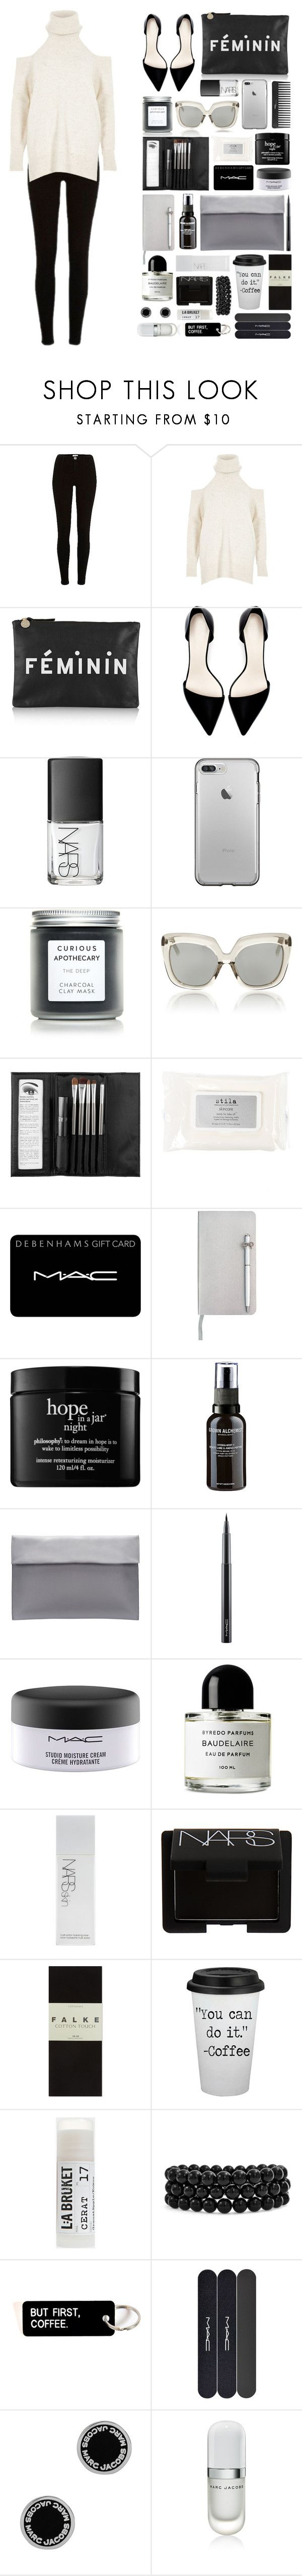 """Everyday outfit"" by mydlak-katarzyna ❤ liked on Polyvore featuring River Island, Clare V., Zara, NARS Cosmetics, SkinCare, Linda Farrow, Sephora Collection, Stila, MAC Cosmetics and ICE London"